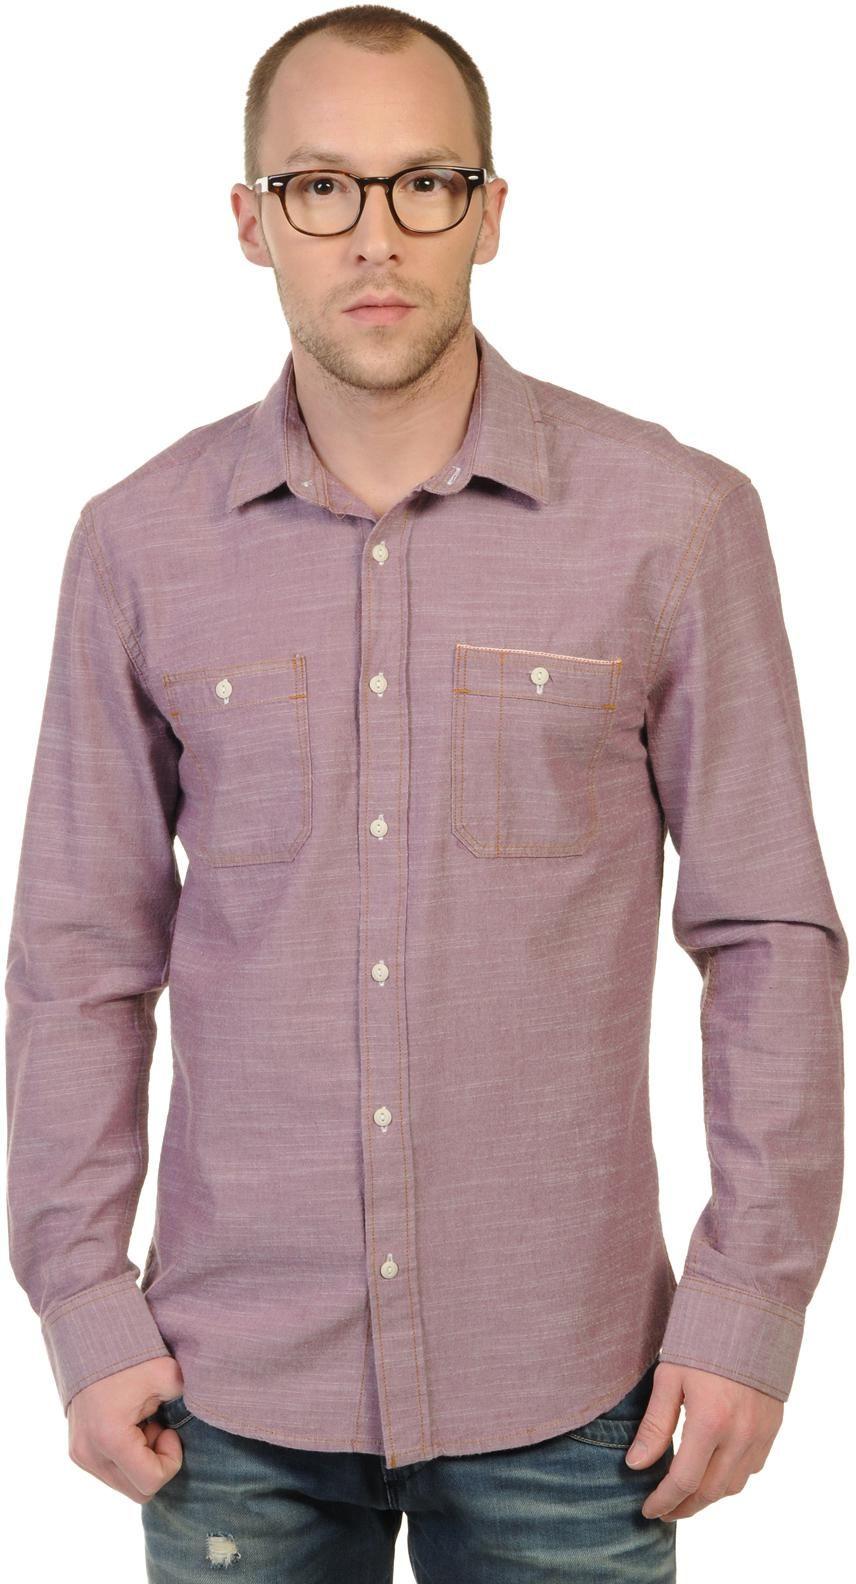 50% DESCUENTO - Selected Camisa Slim Fit - Hombre - rojo - S|M|L - clásico cuello Kent - SELECTED